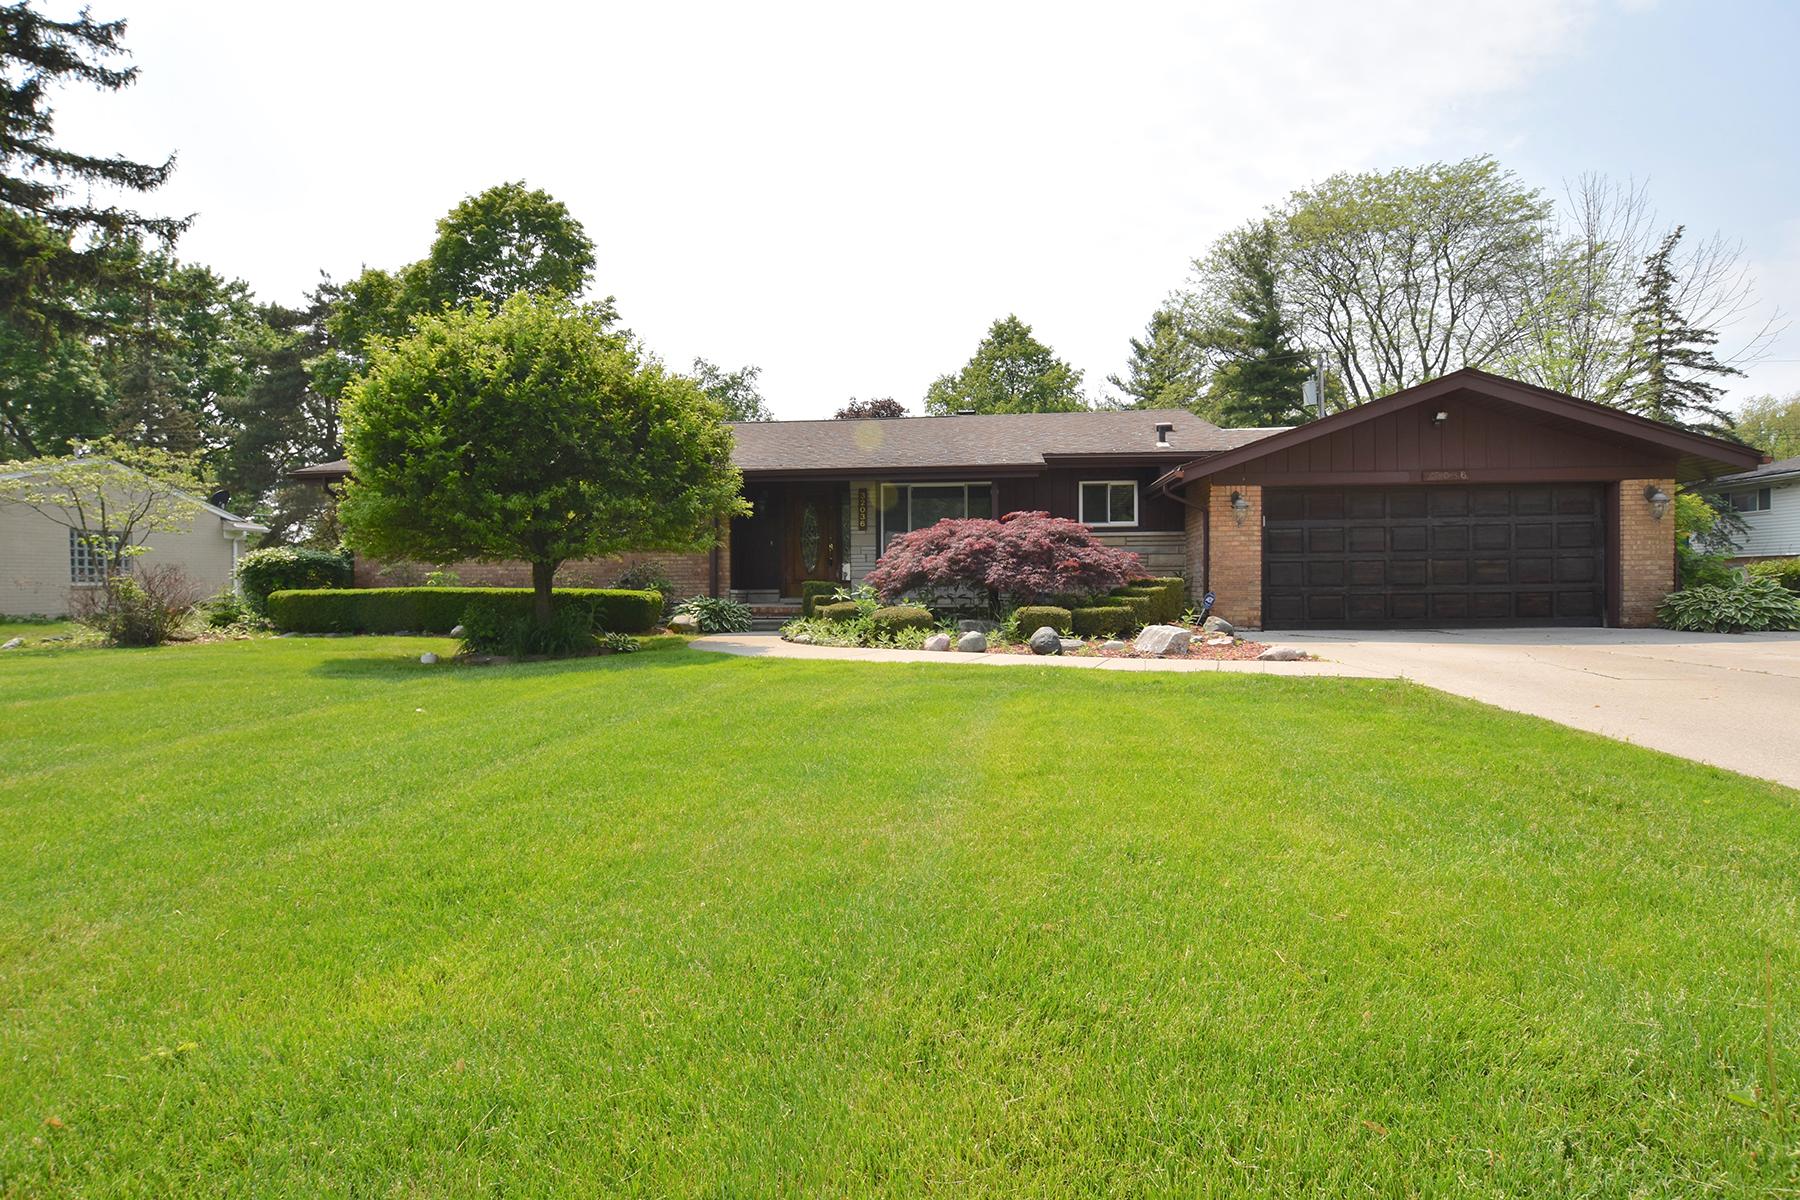 Single Family Homes for Sale at Farmington Hills 32036 Red Clover Road Farmington Hills, Michigan 48334 United States